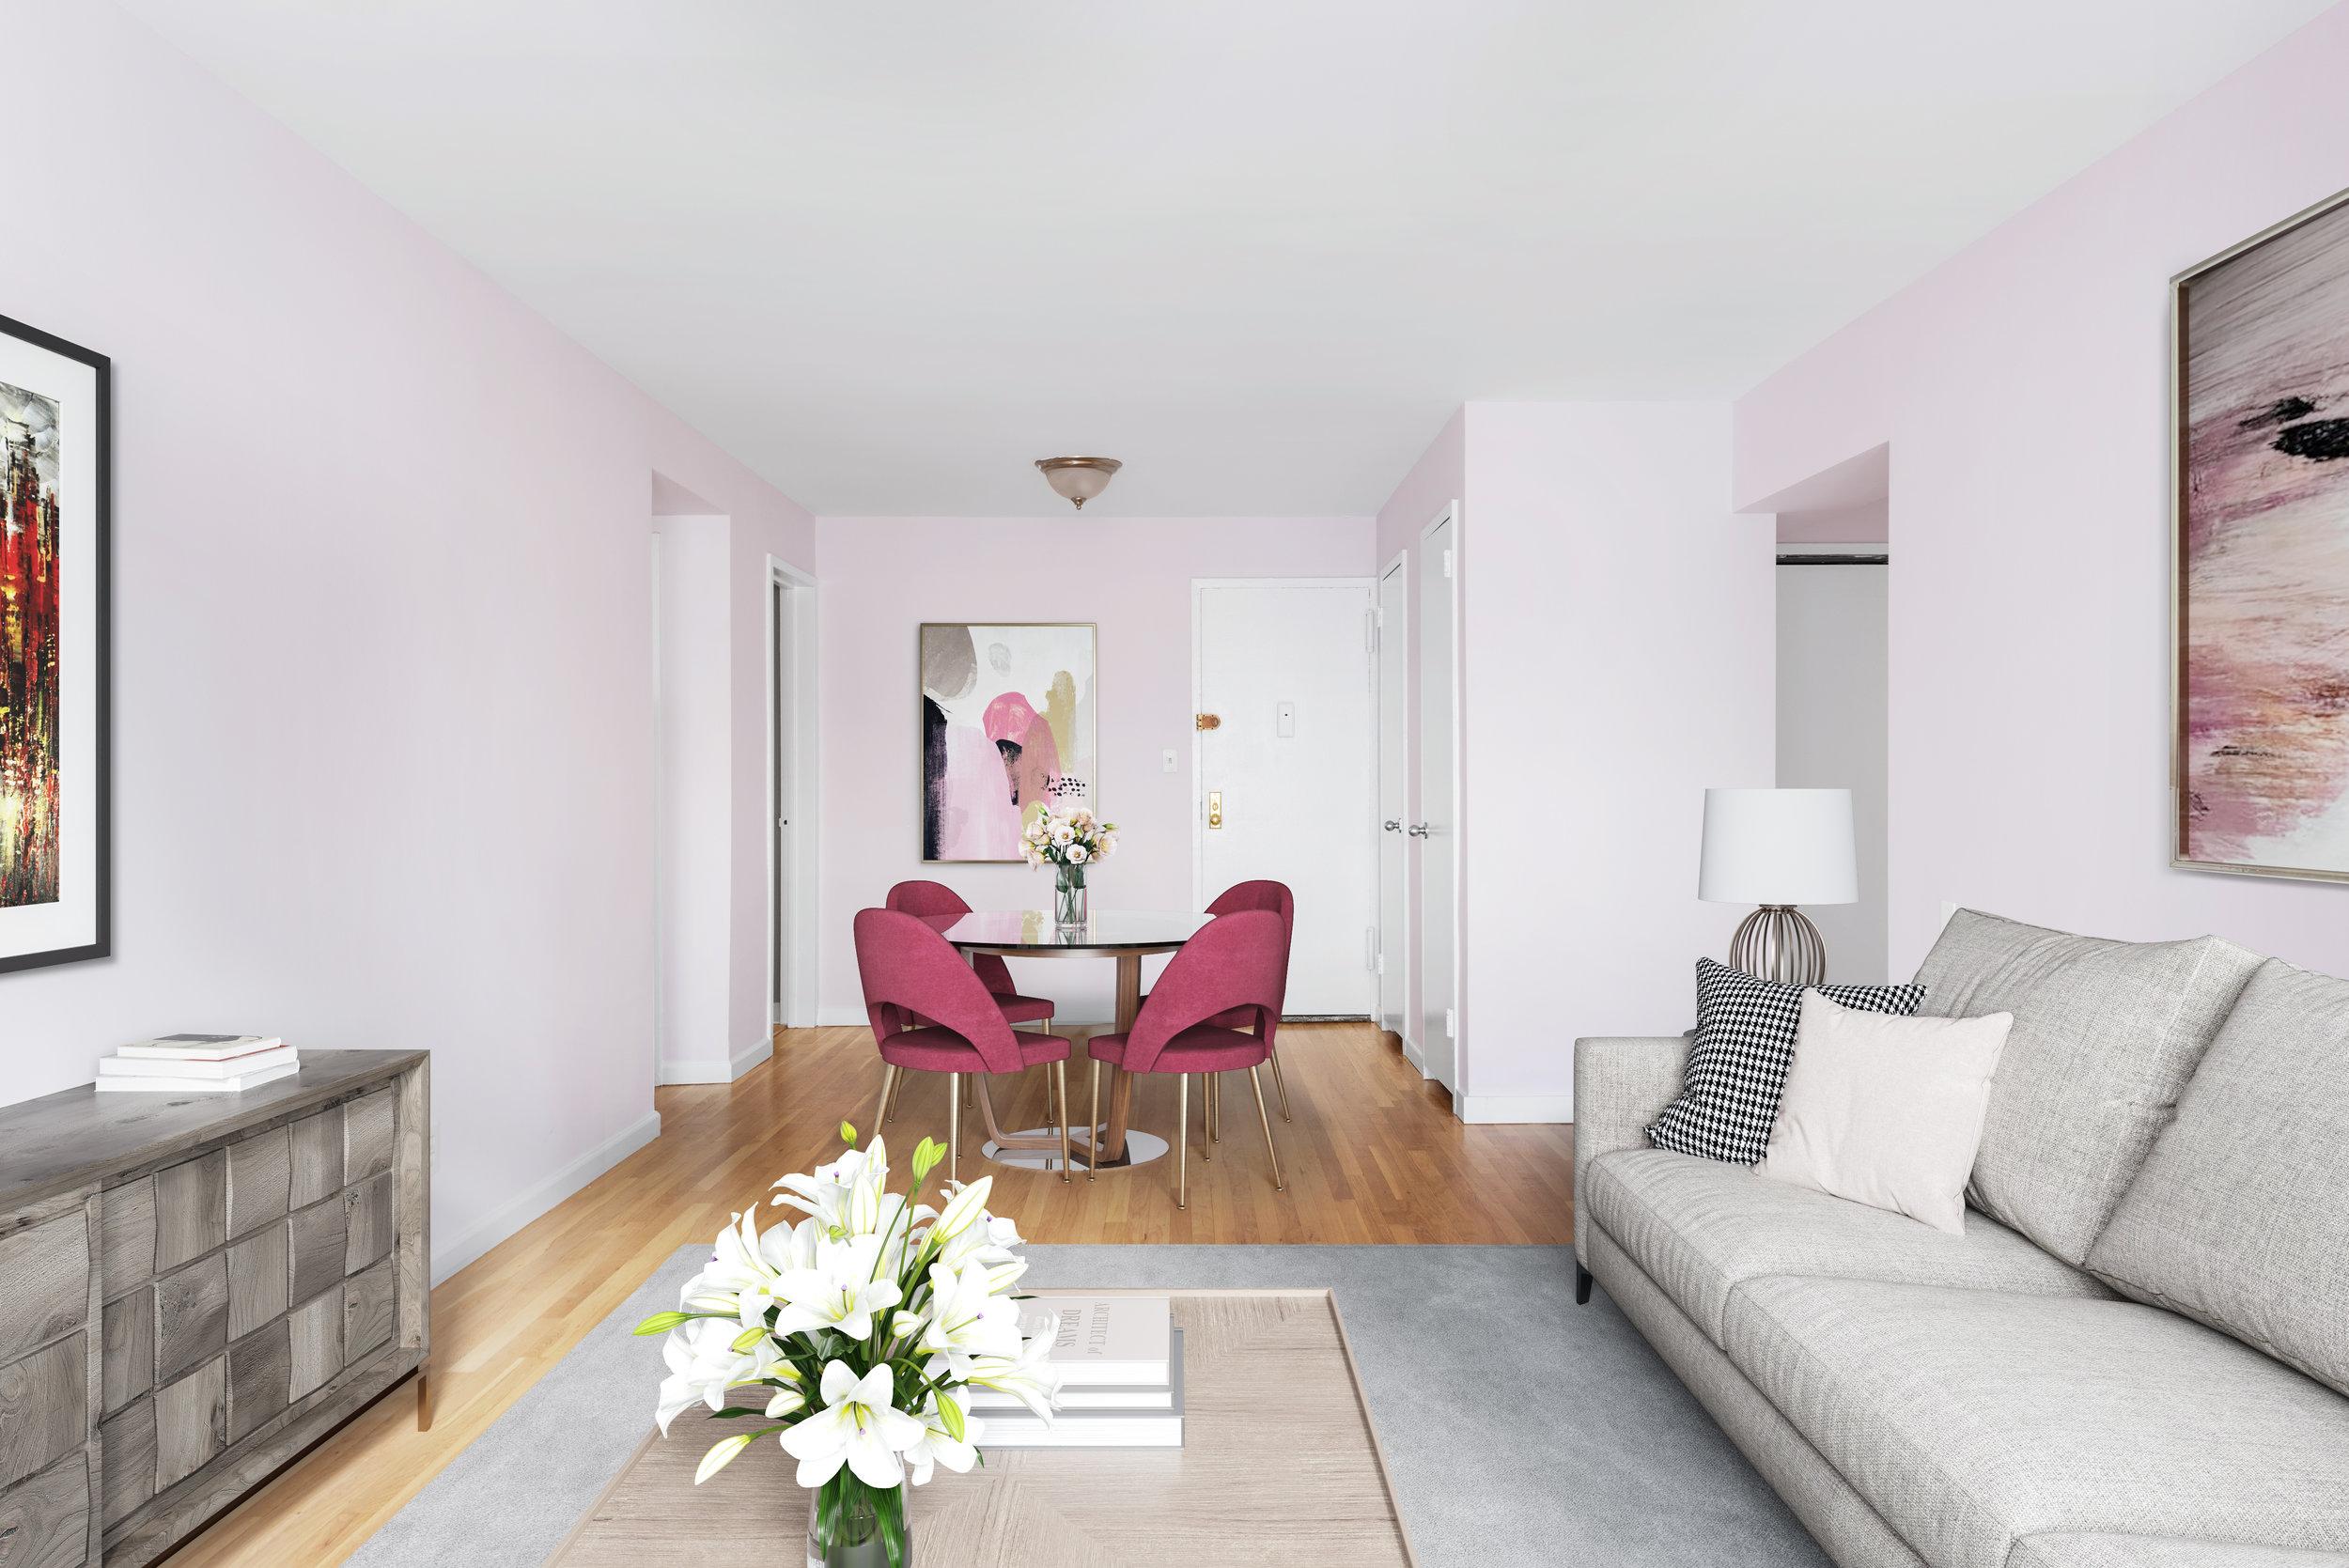 Union Square living room by Bolster.jpg